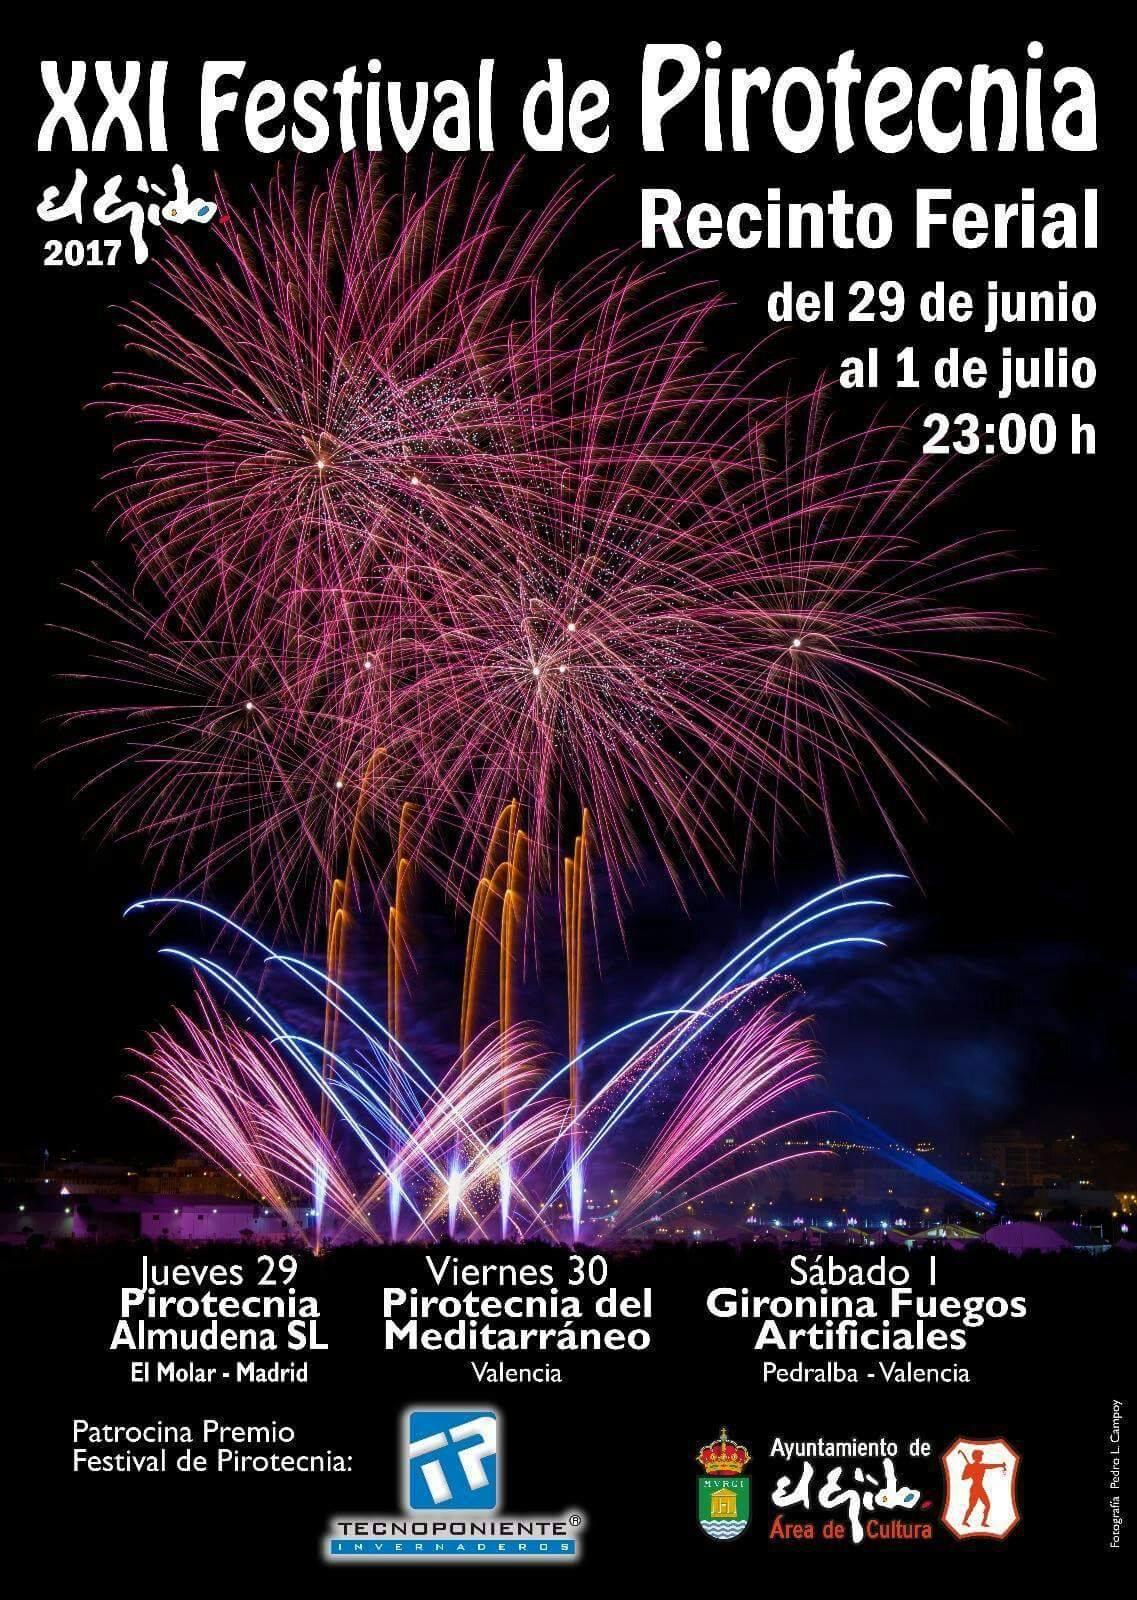 XXI FESTIVAL DE PIROTECNIA EL EJIDO-ALMERIA 2017